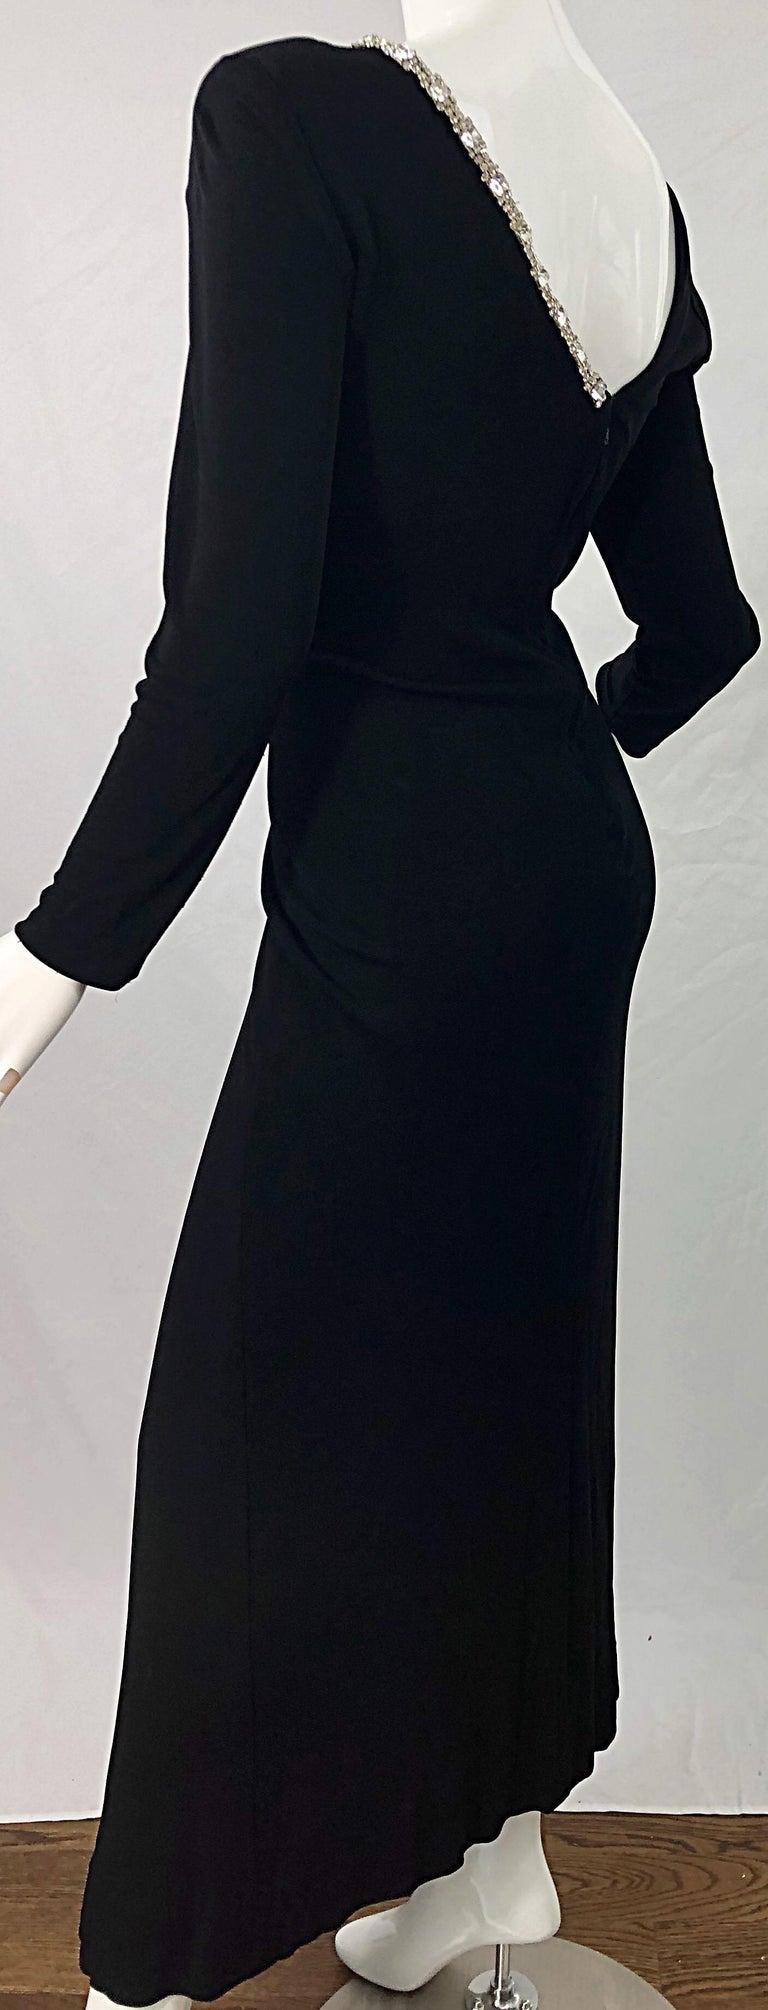 1980s Travilla Size 10 Black Matte Silk Jersey Rhinestone Vintage 80s Gown Dress For Sale 5